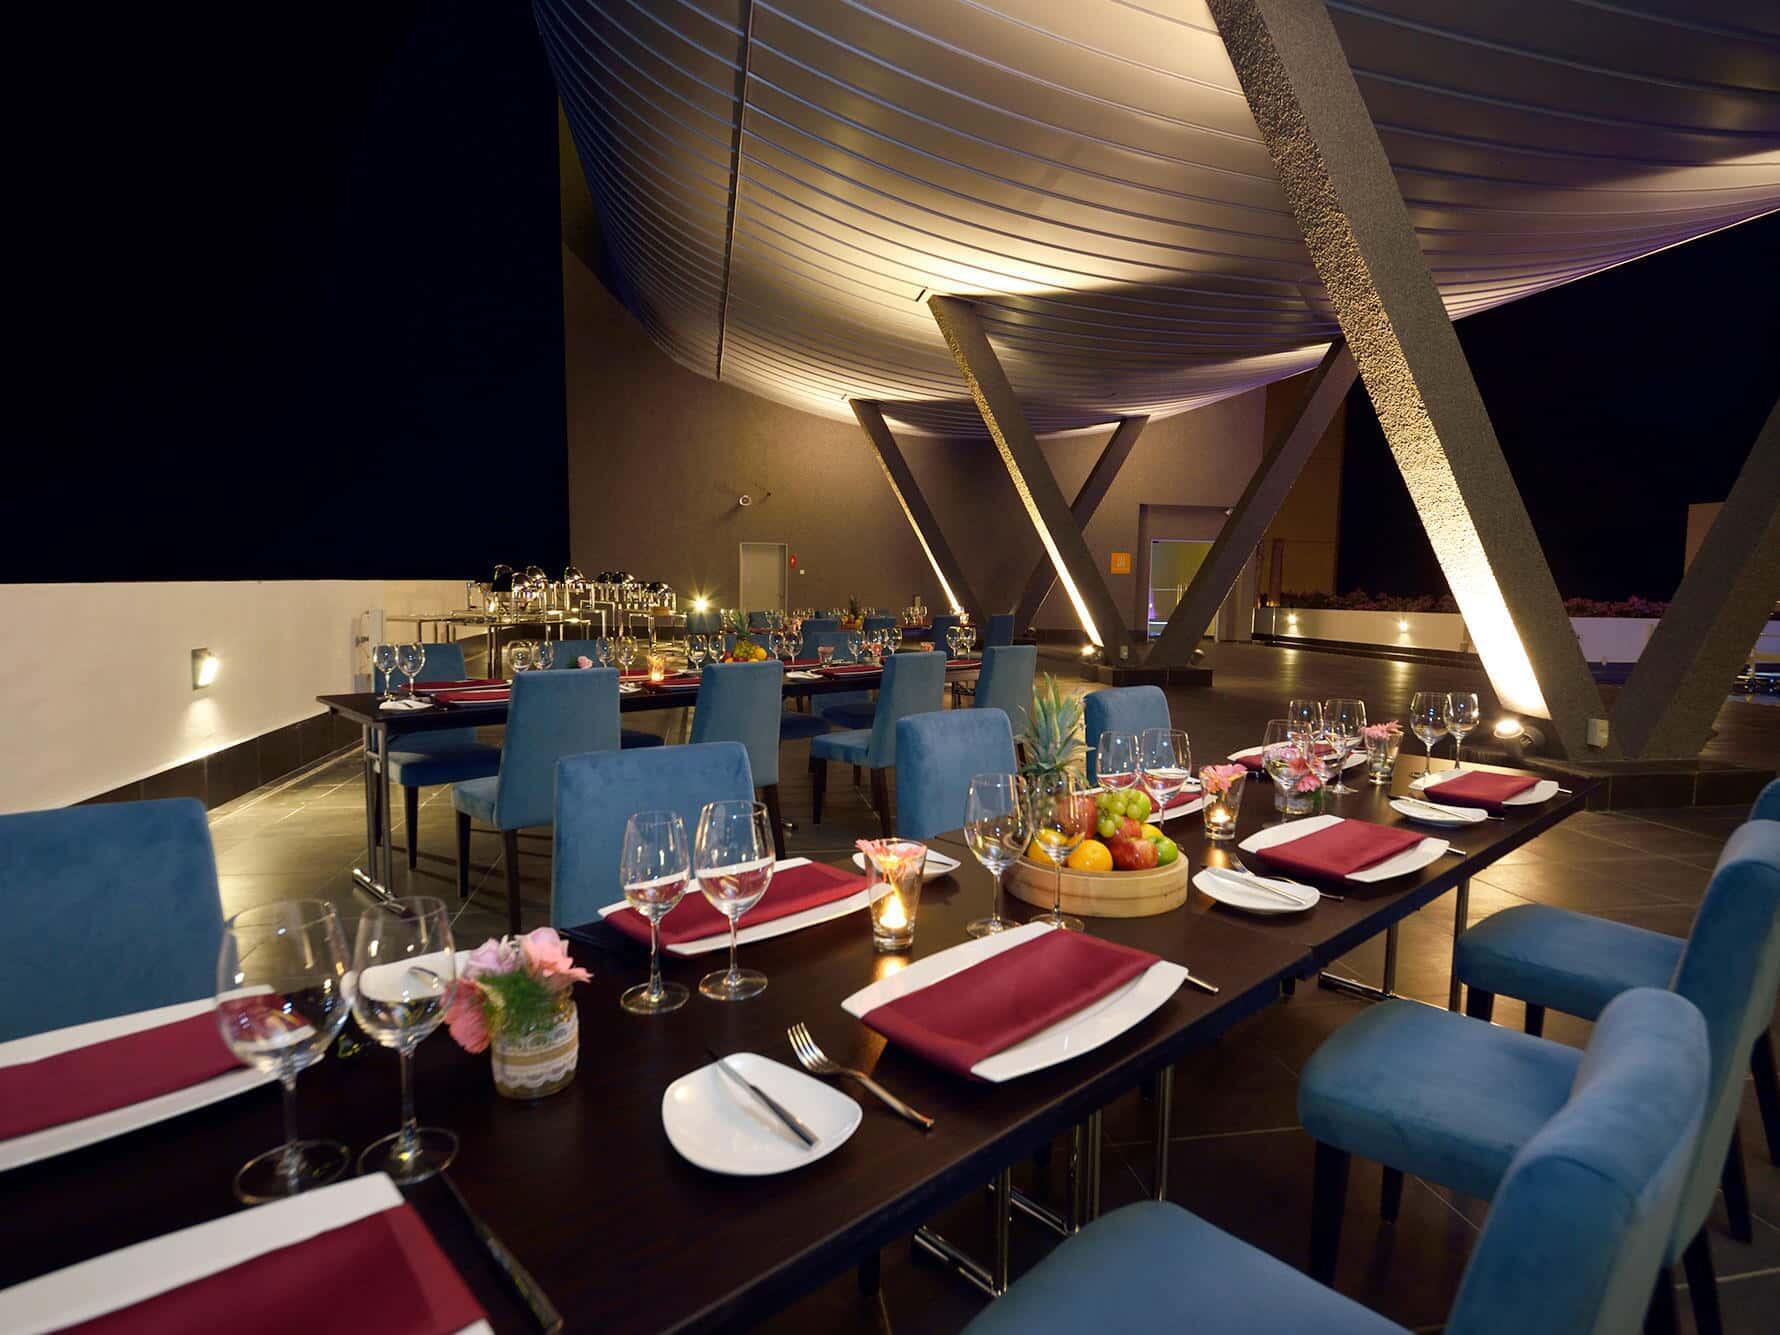 Sky Terrace Restaurant Dining Area 1